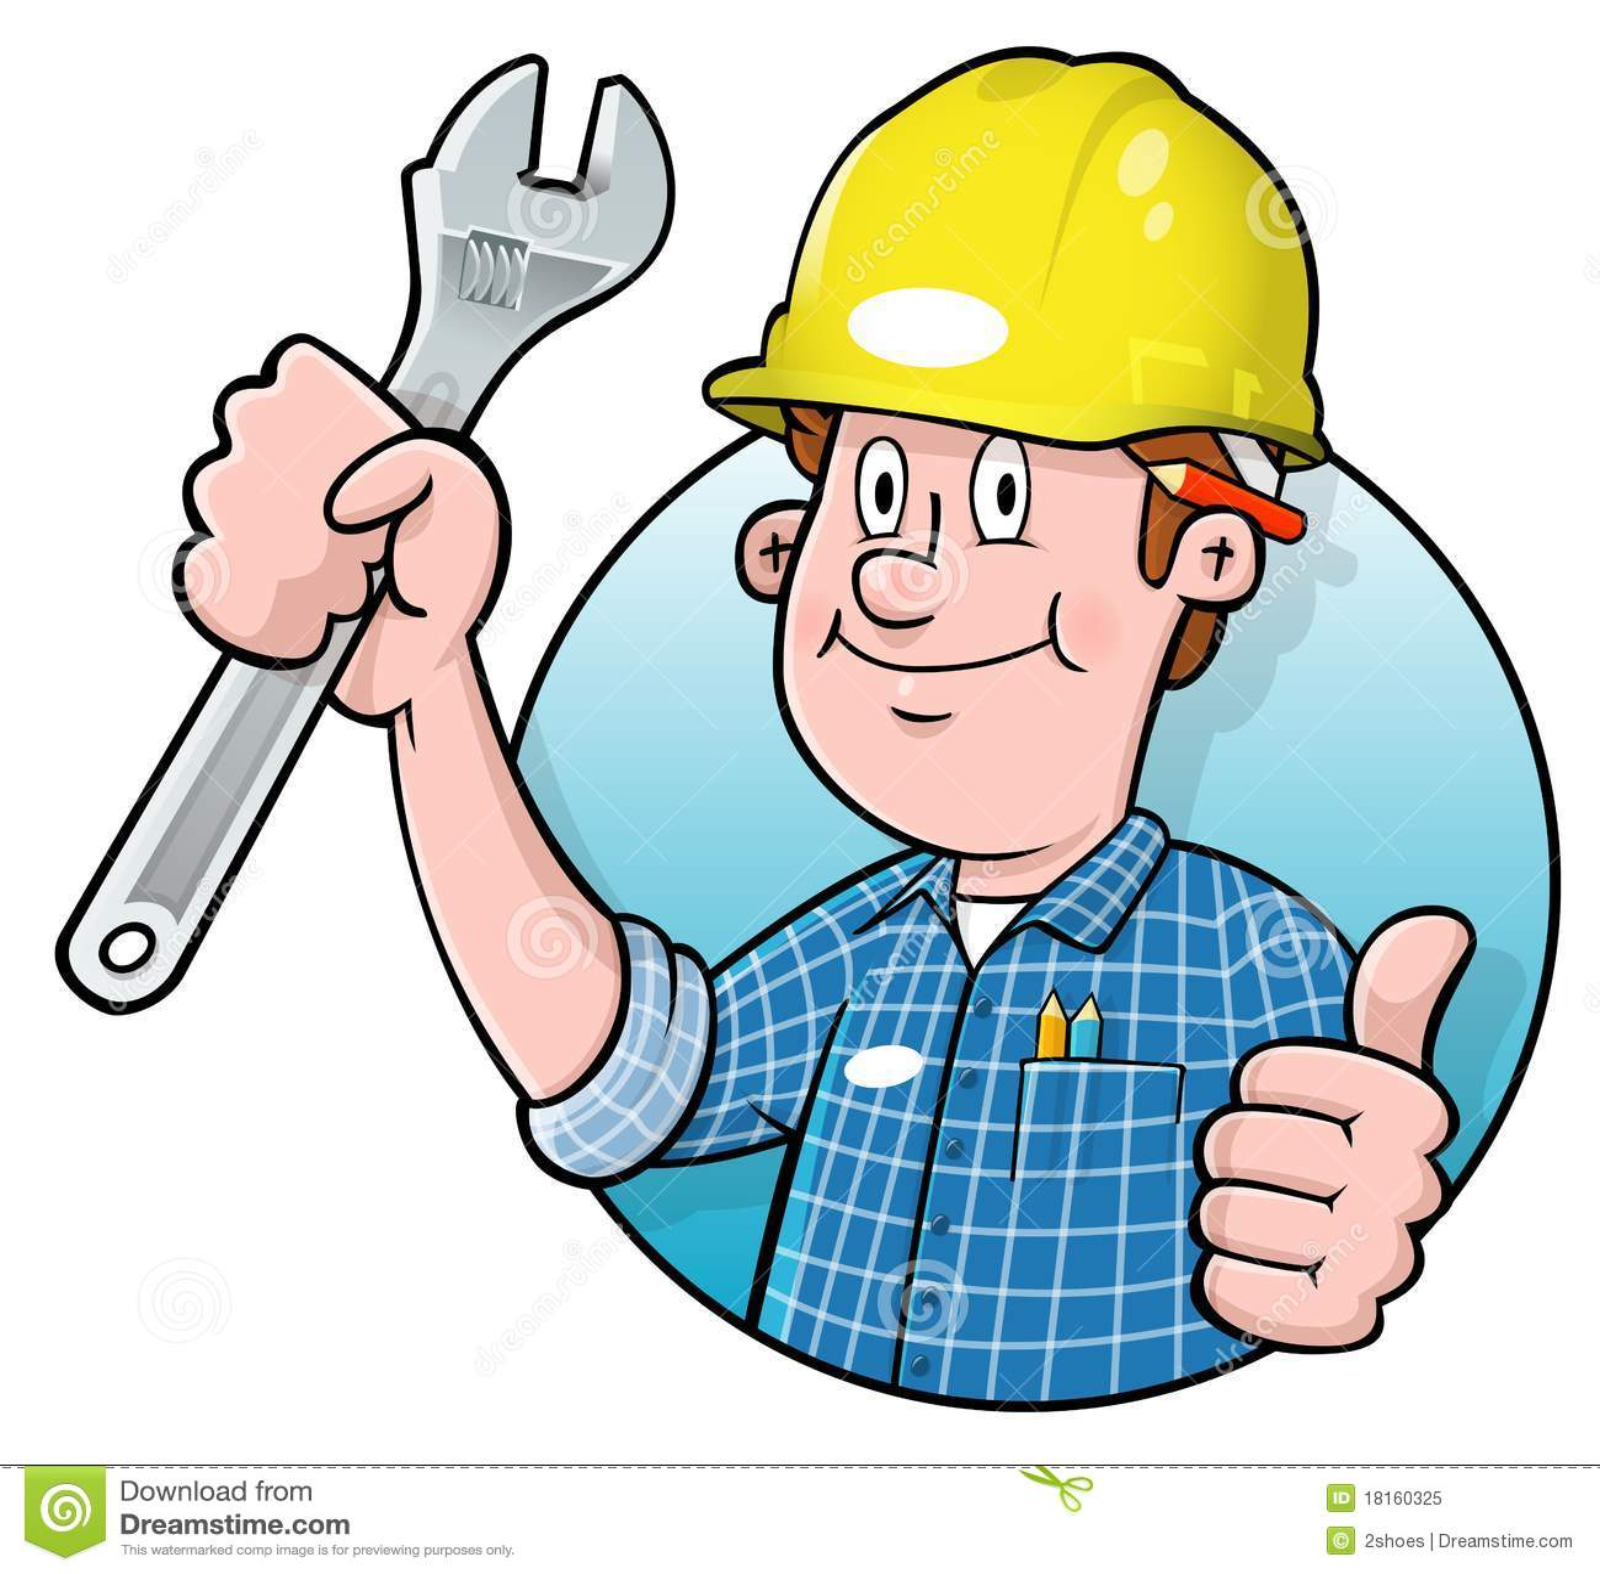 clipart construction worker cartoon - photo #39